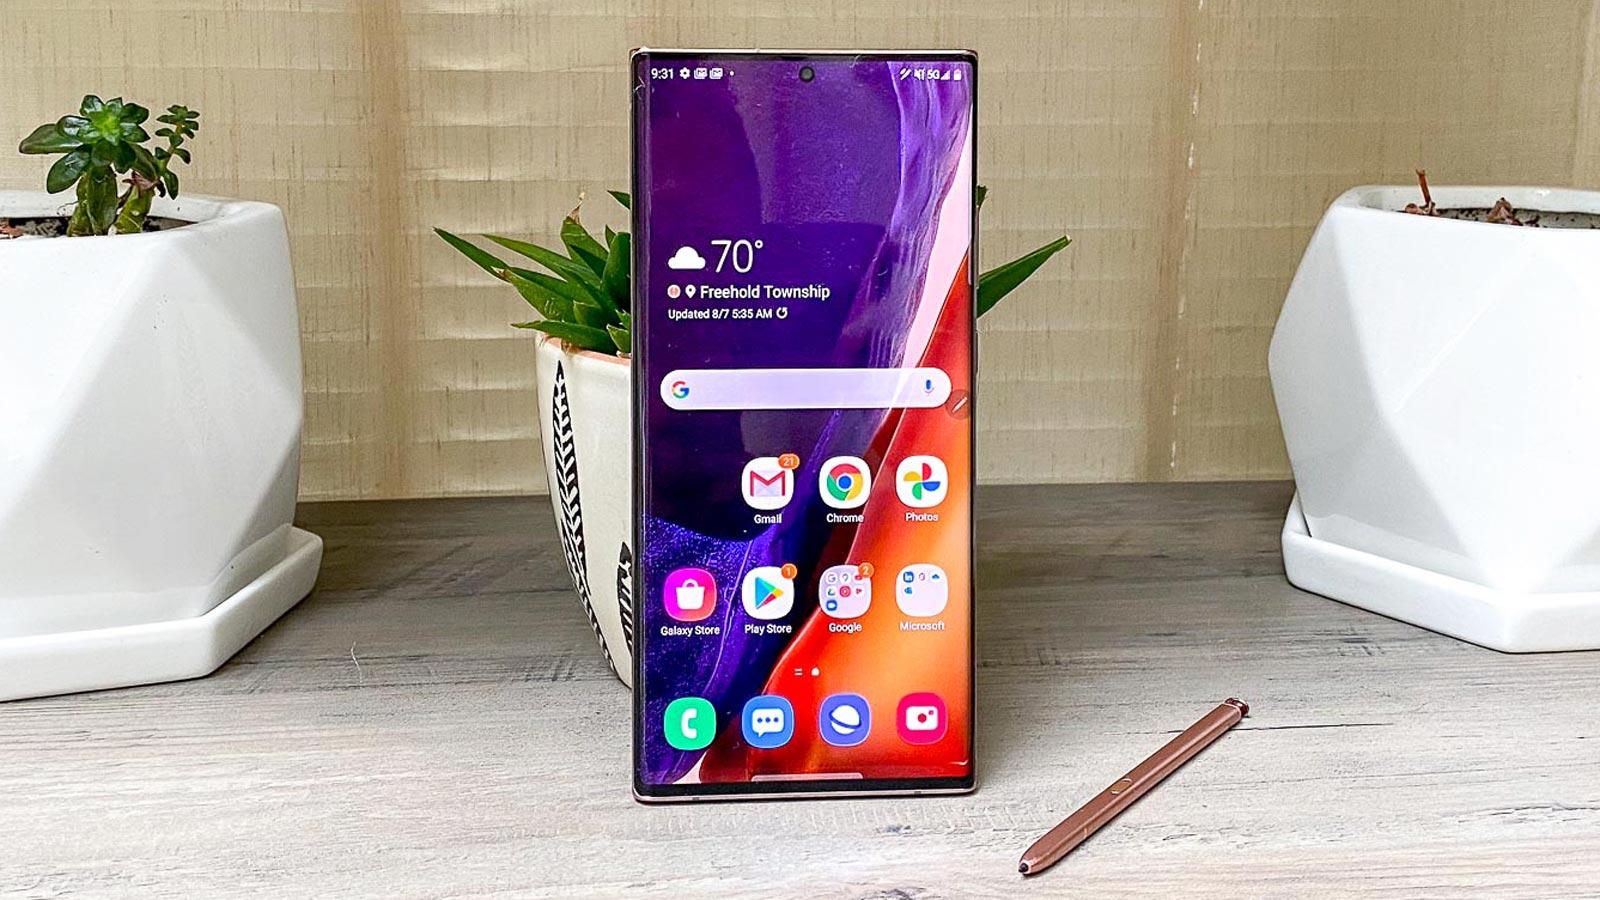 Samsung Galaxy Note 20 Ultra image